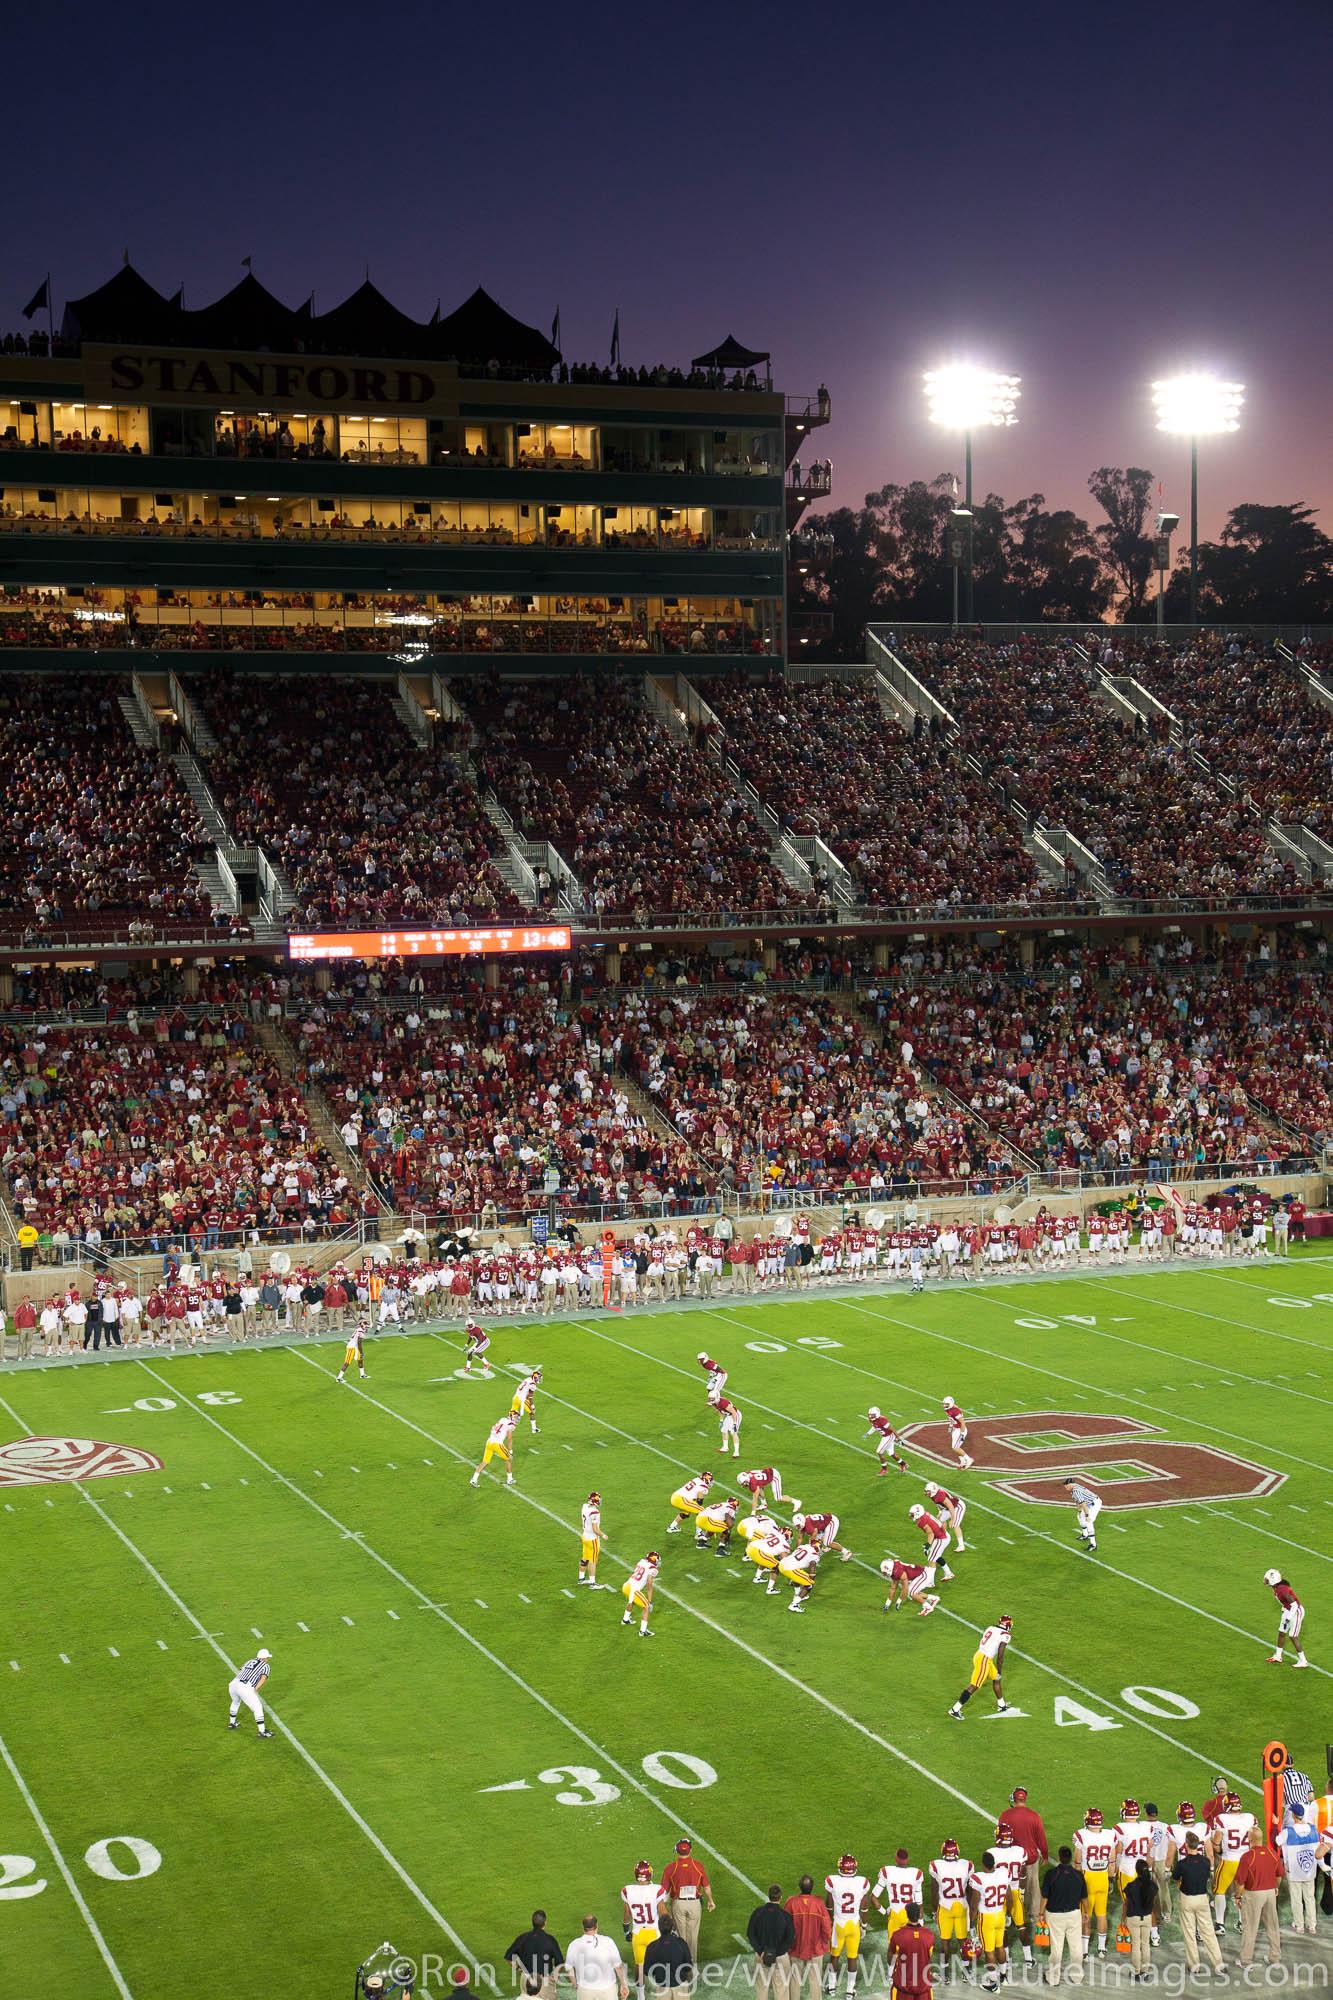 College football game at Stanford Stadium, Stanford, CA